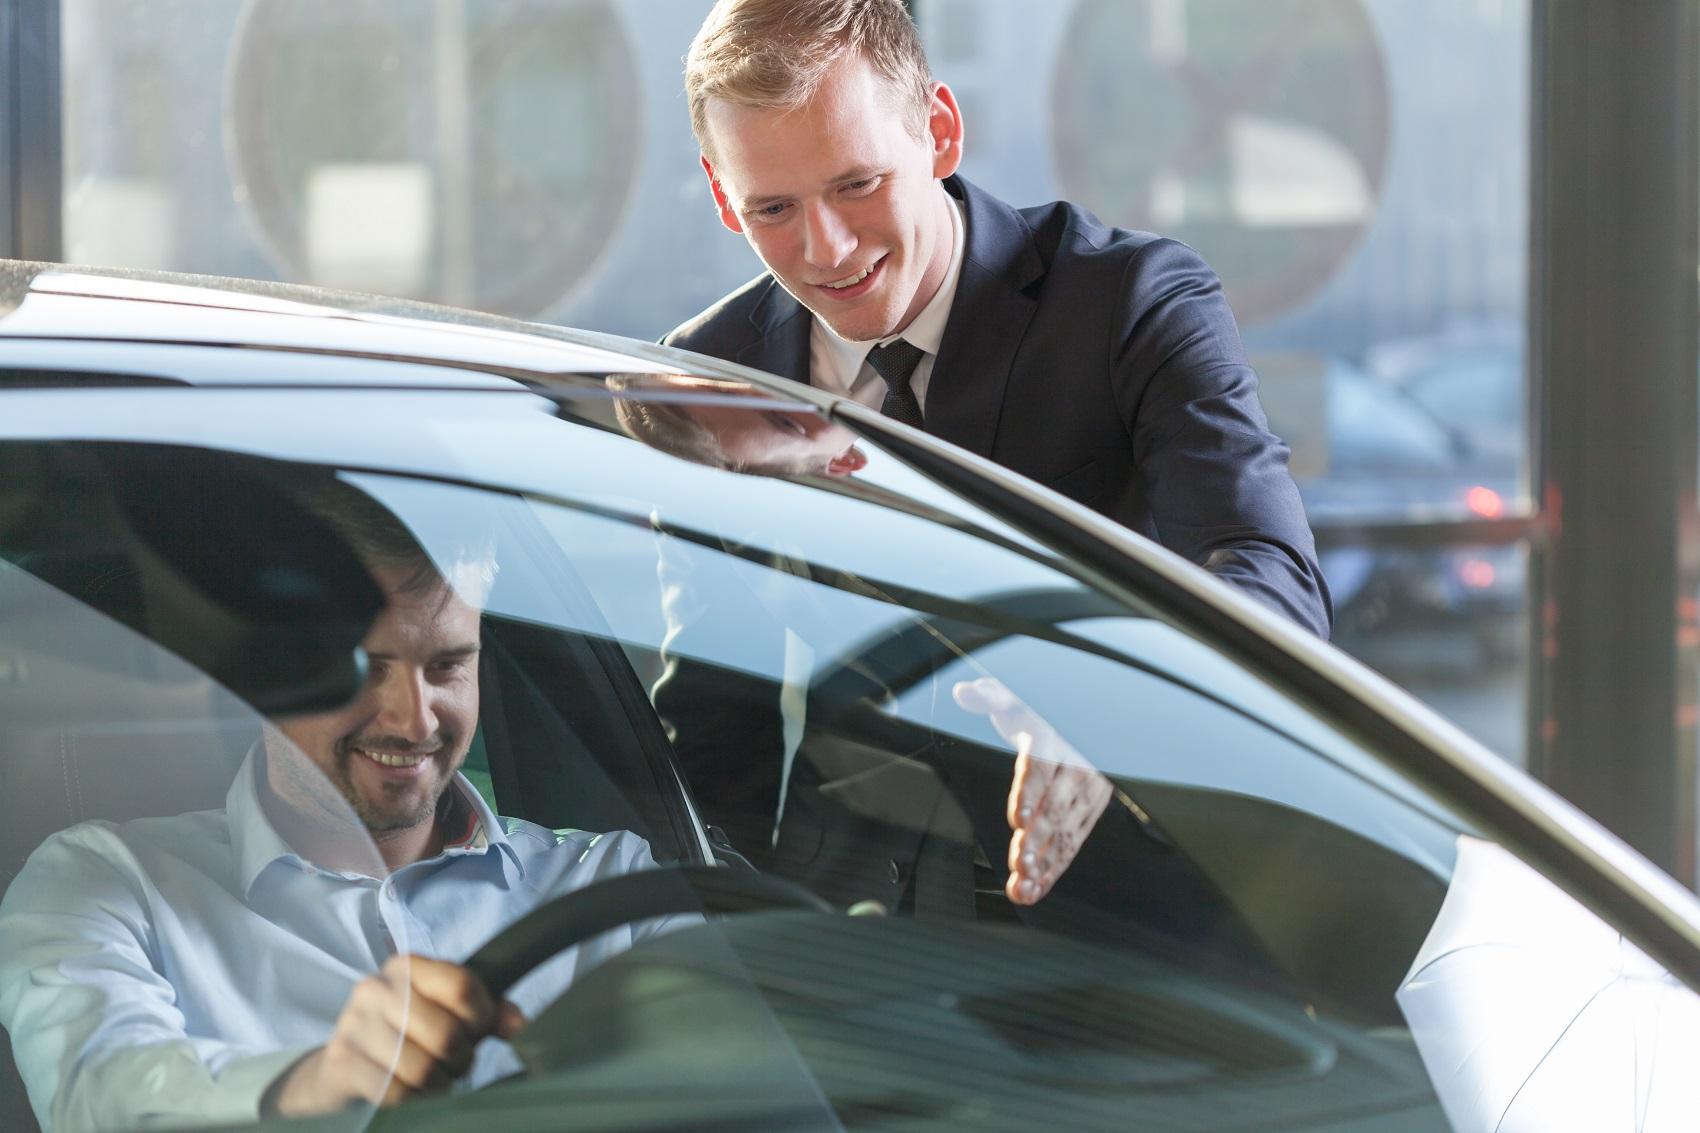 Taking a Drive at Dealership